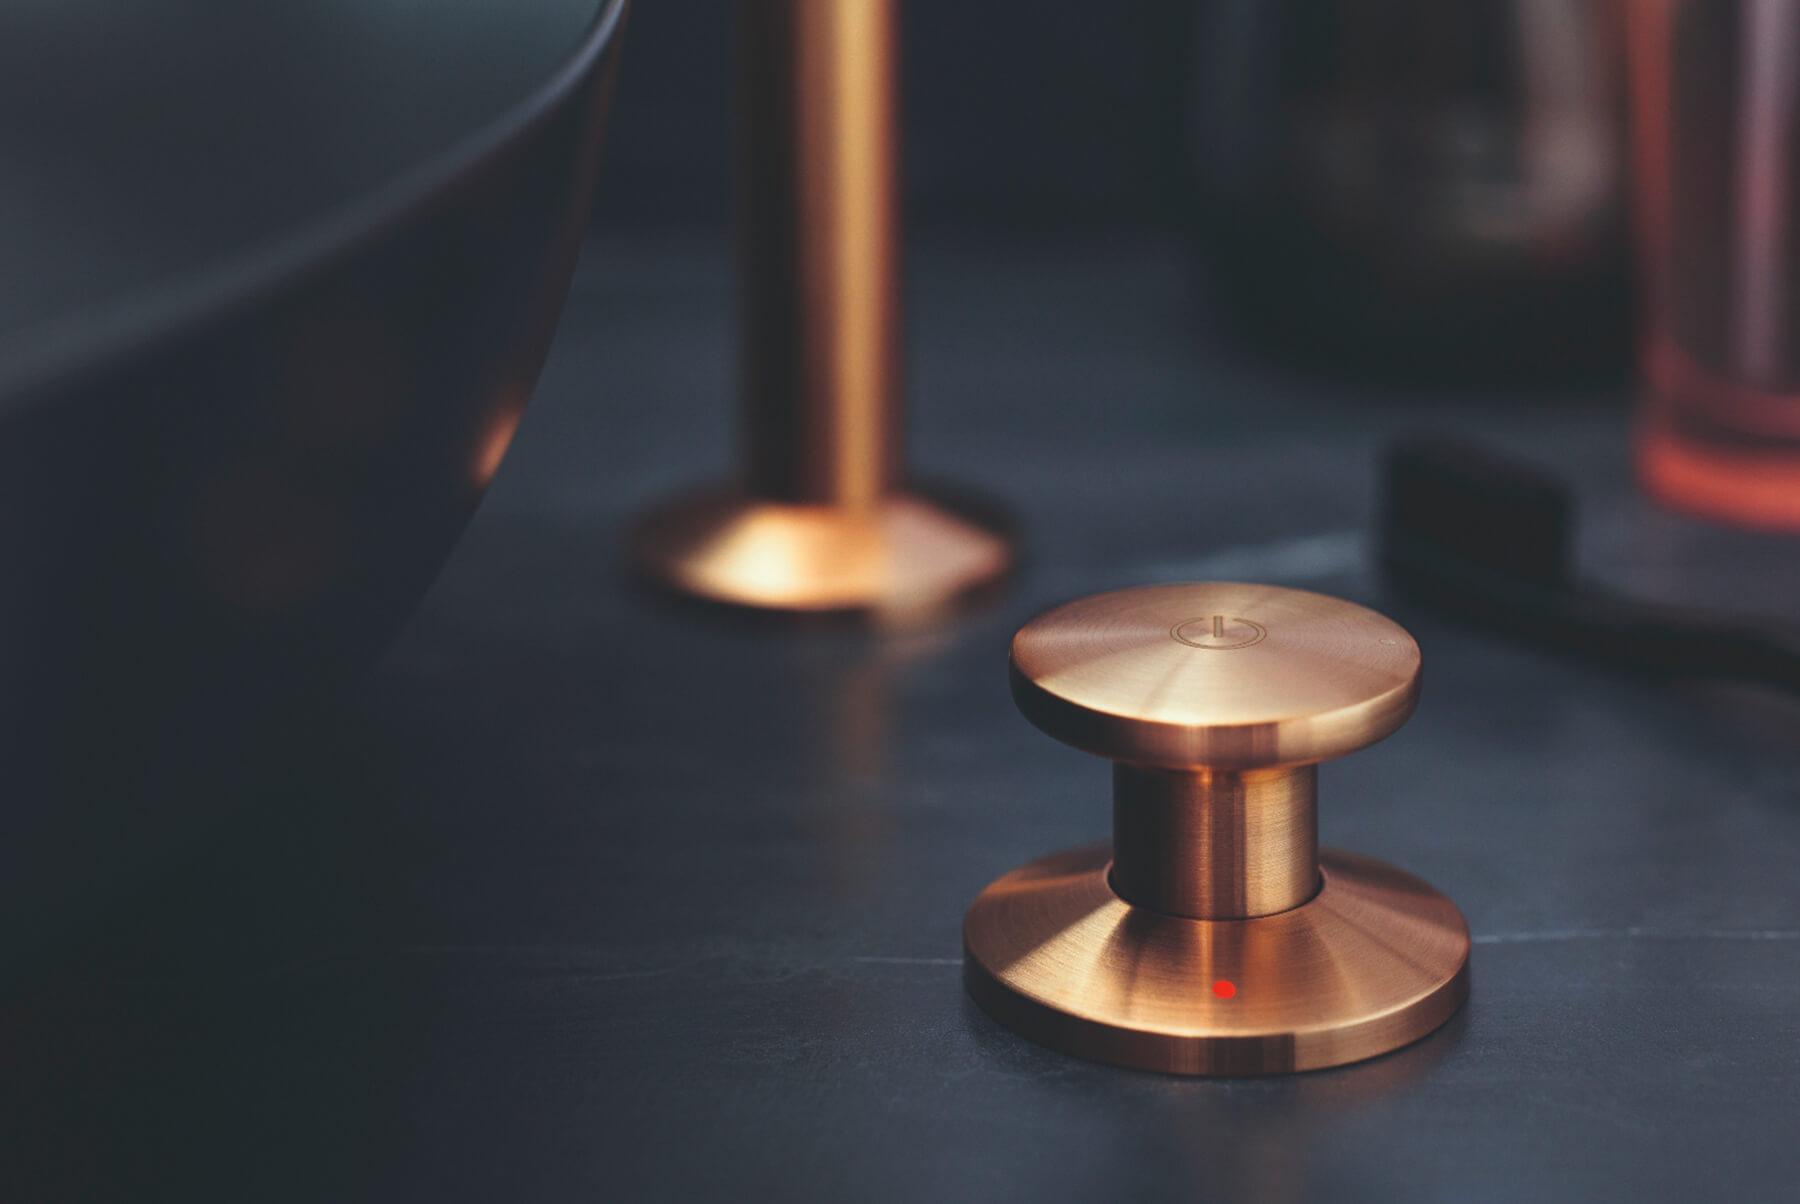 Brassware-AXOR-ONE-INSET-6-1800x1204